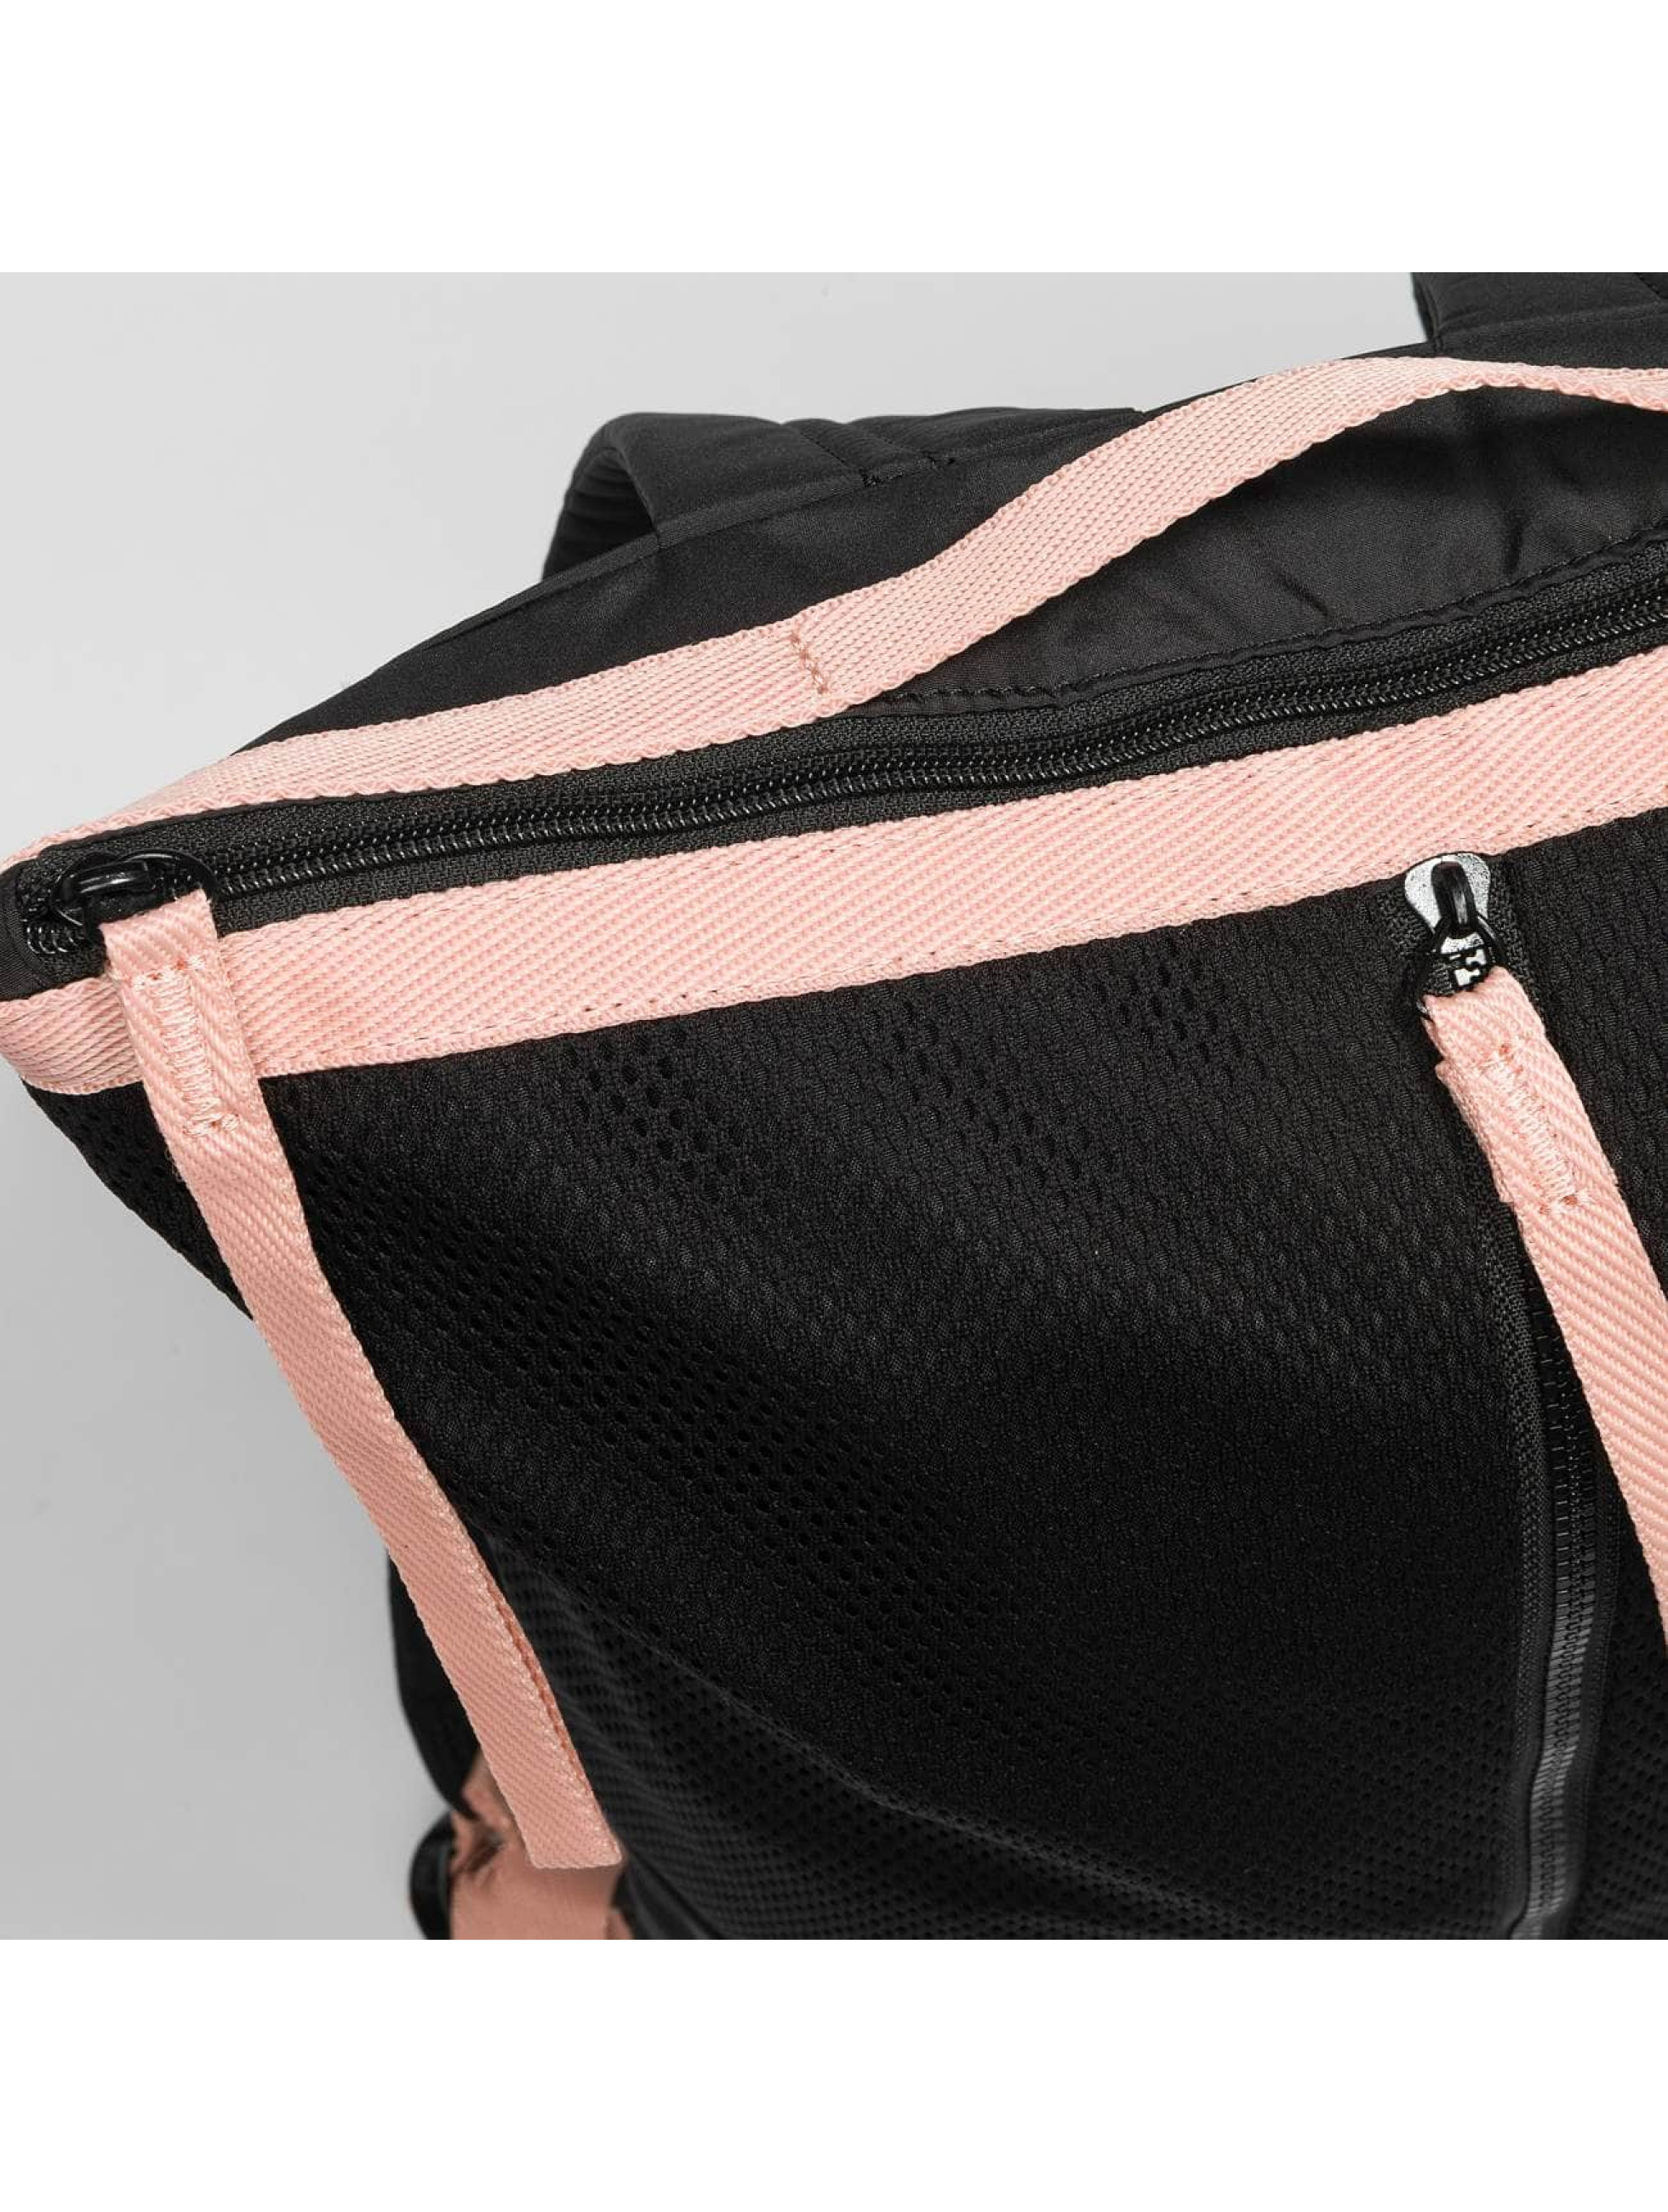 Puma Ryggsäck Prime Zip svart